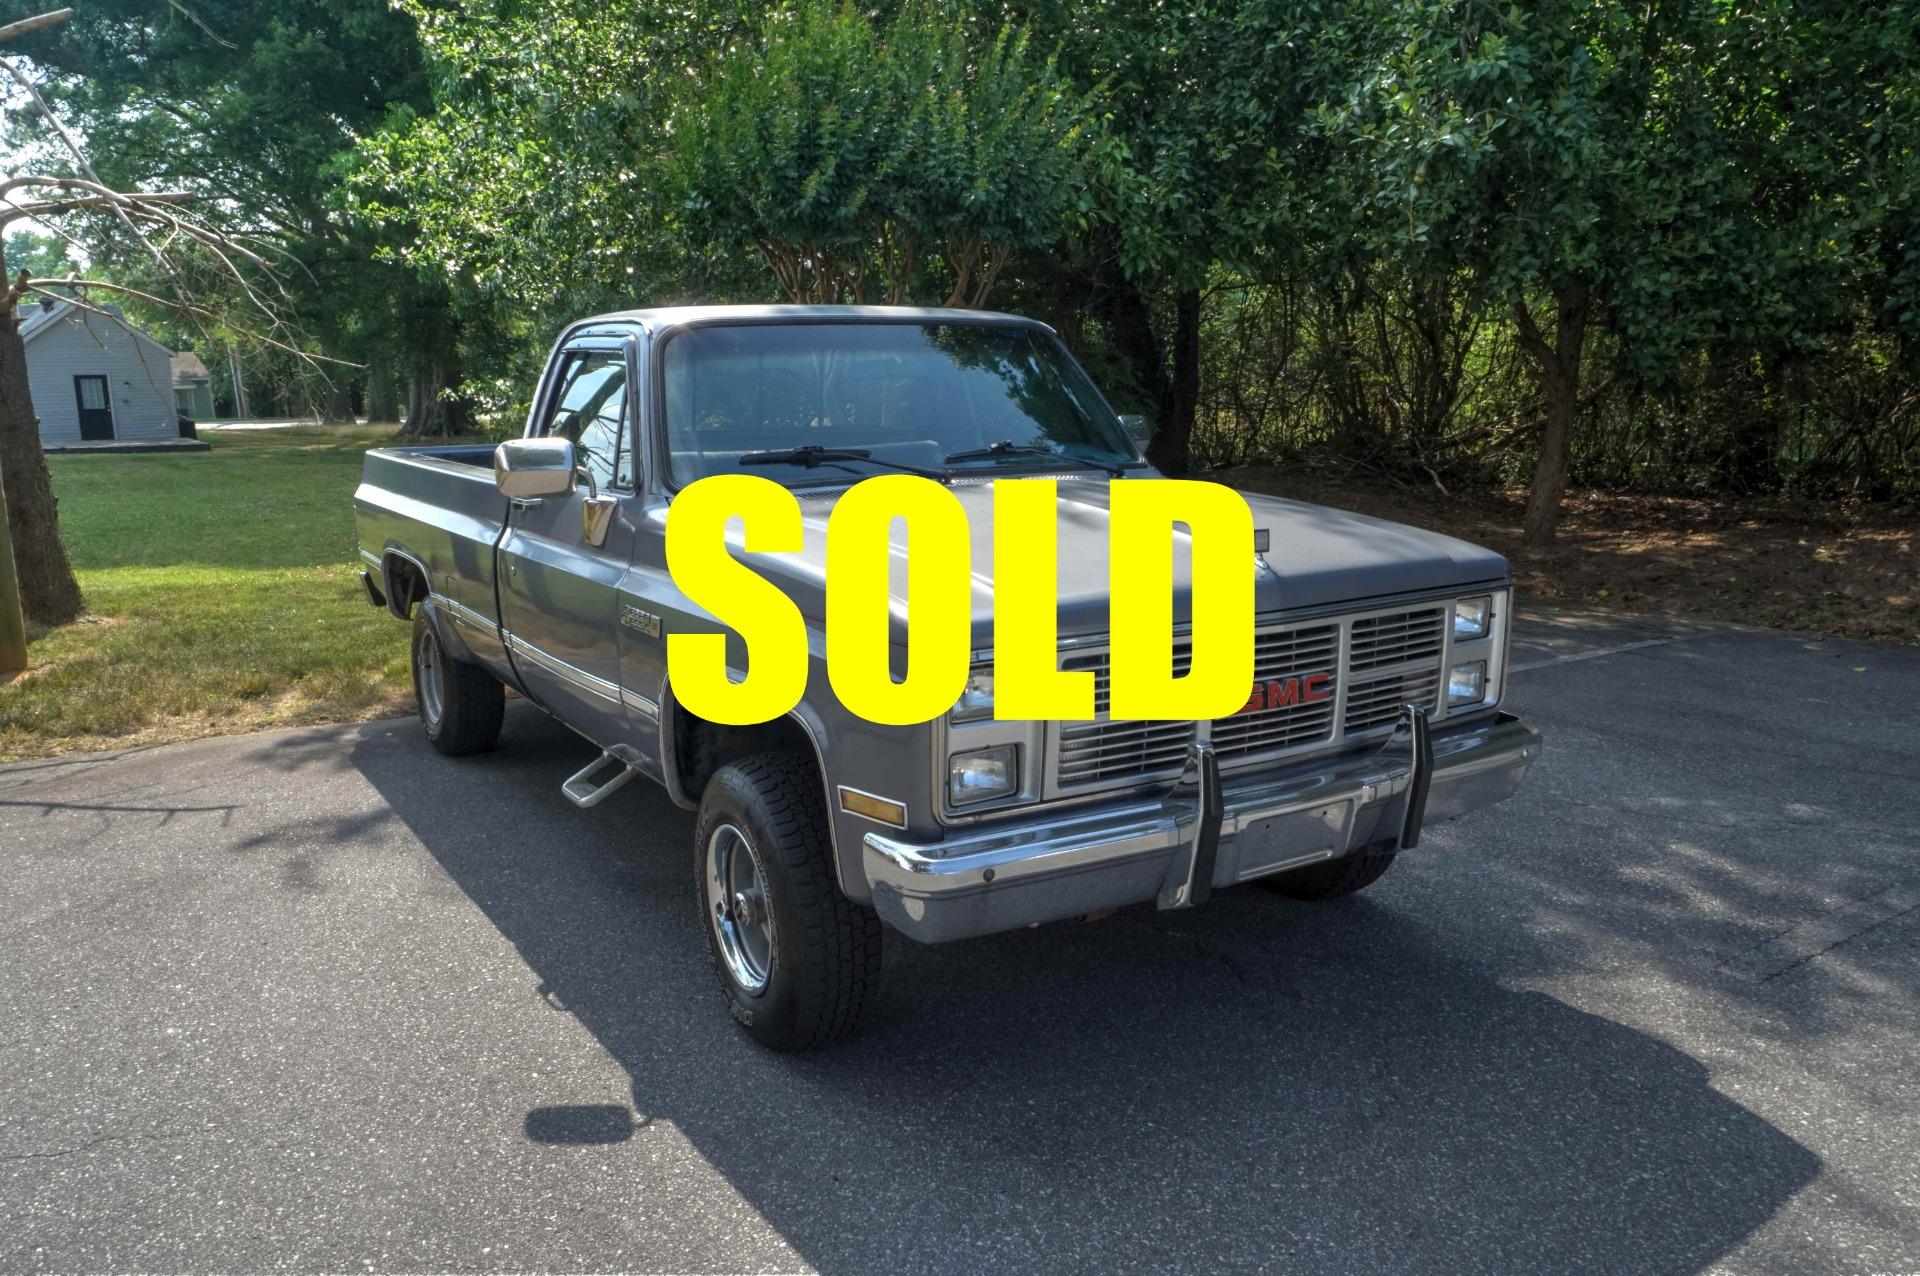 1987 GMC Sierra Classic 1500 Pickup Truck